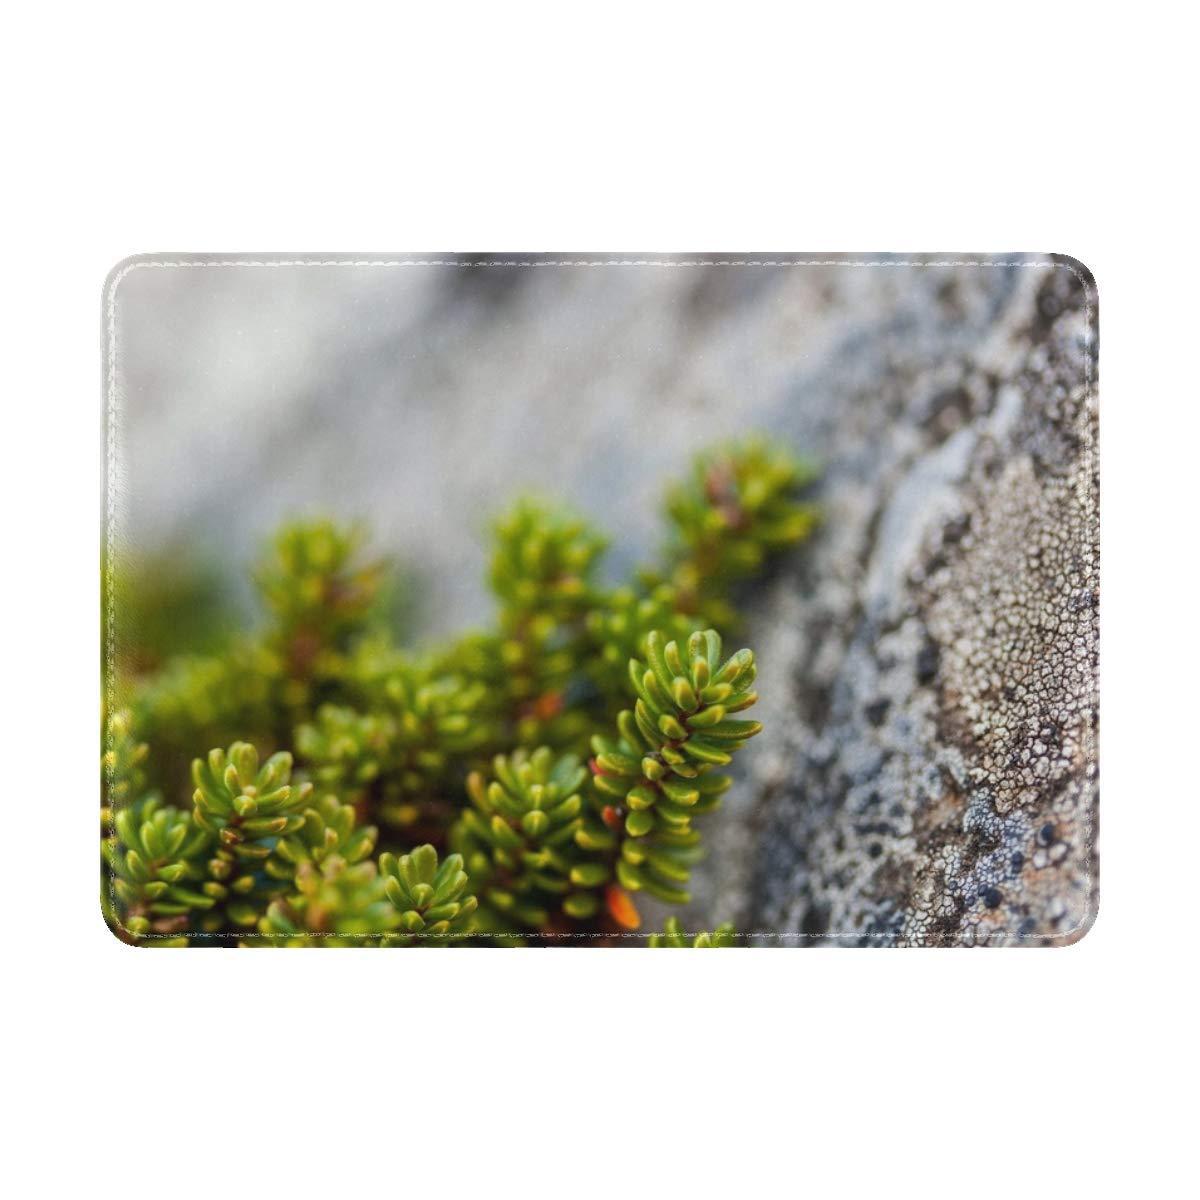 Plants Rocks Macro Leather Passport Holder Cover Case Travel One Pocket